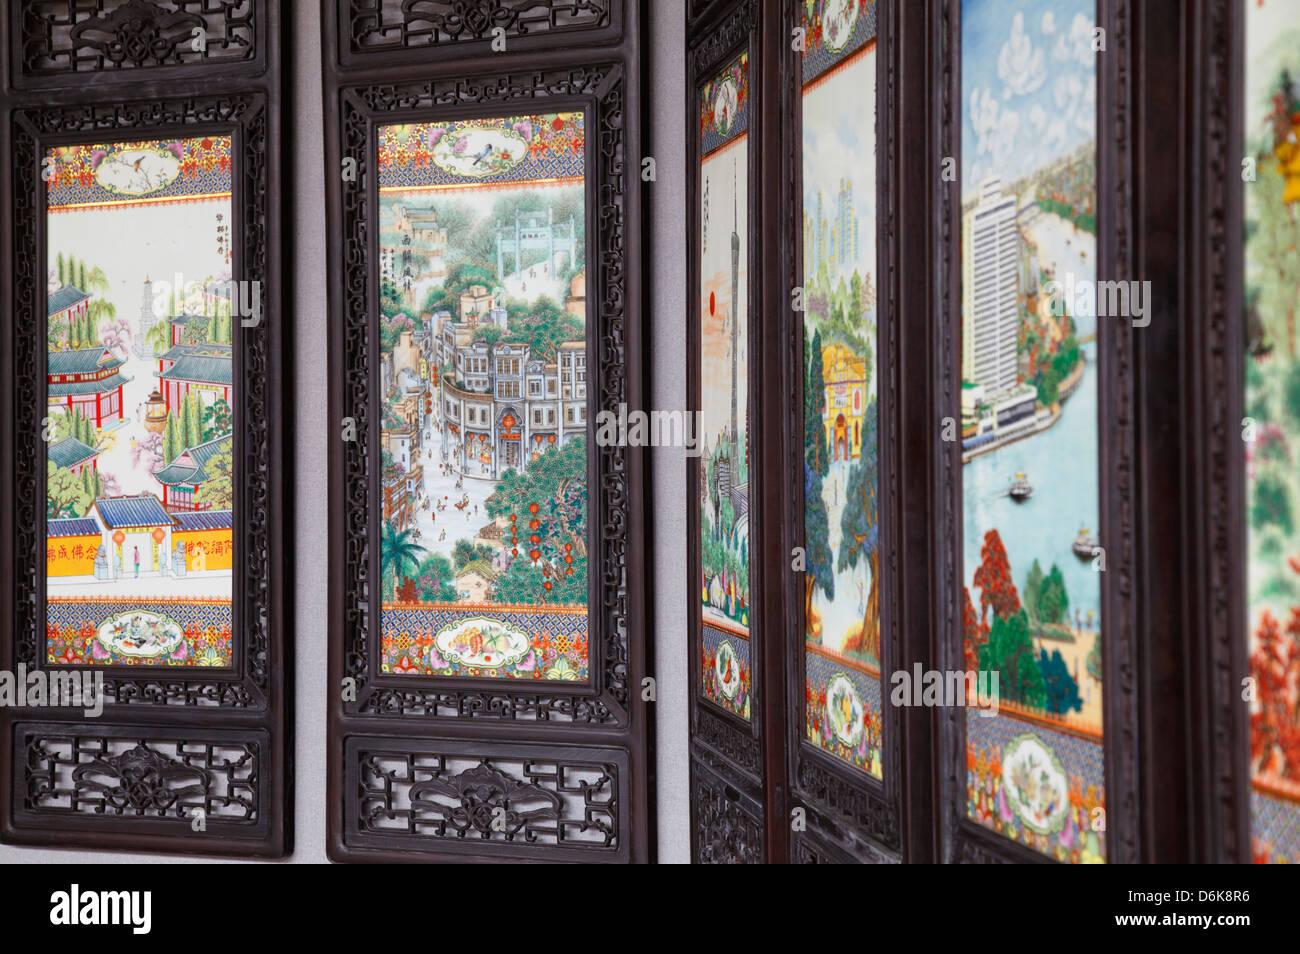 Decorative screens at Chen Clan Academy, Guangzhou, Guangdong, China, Asia - Stock Image